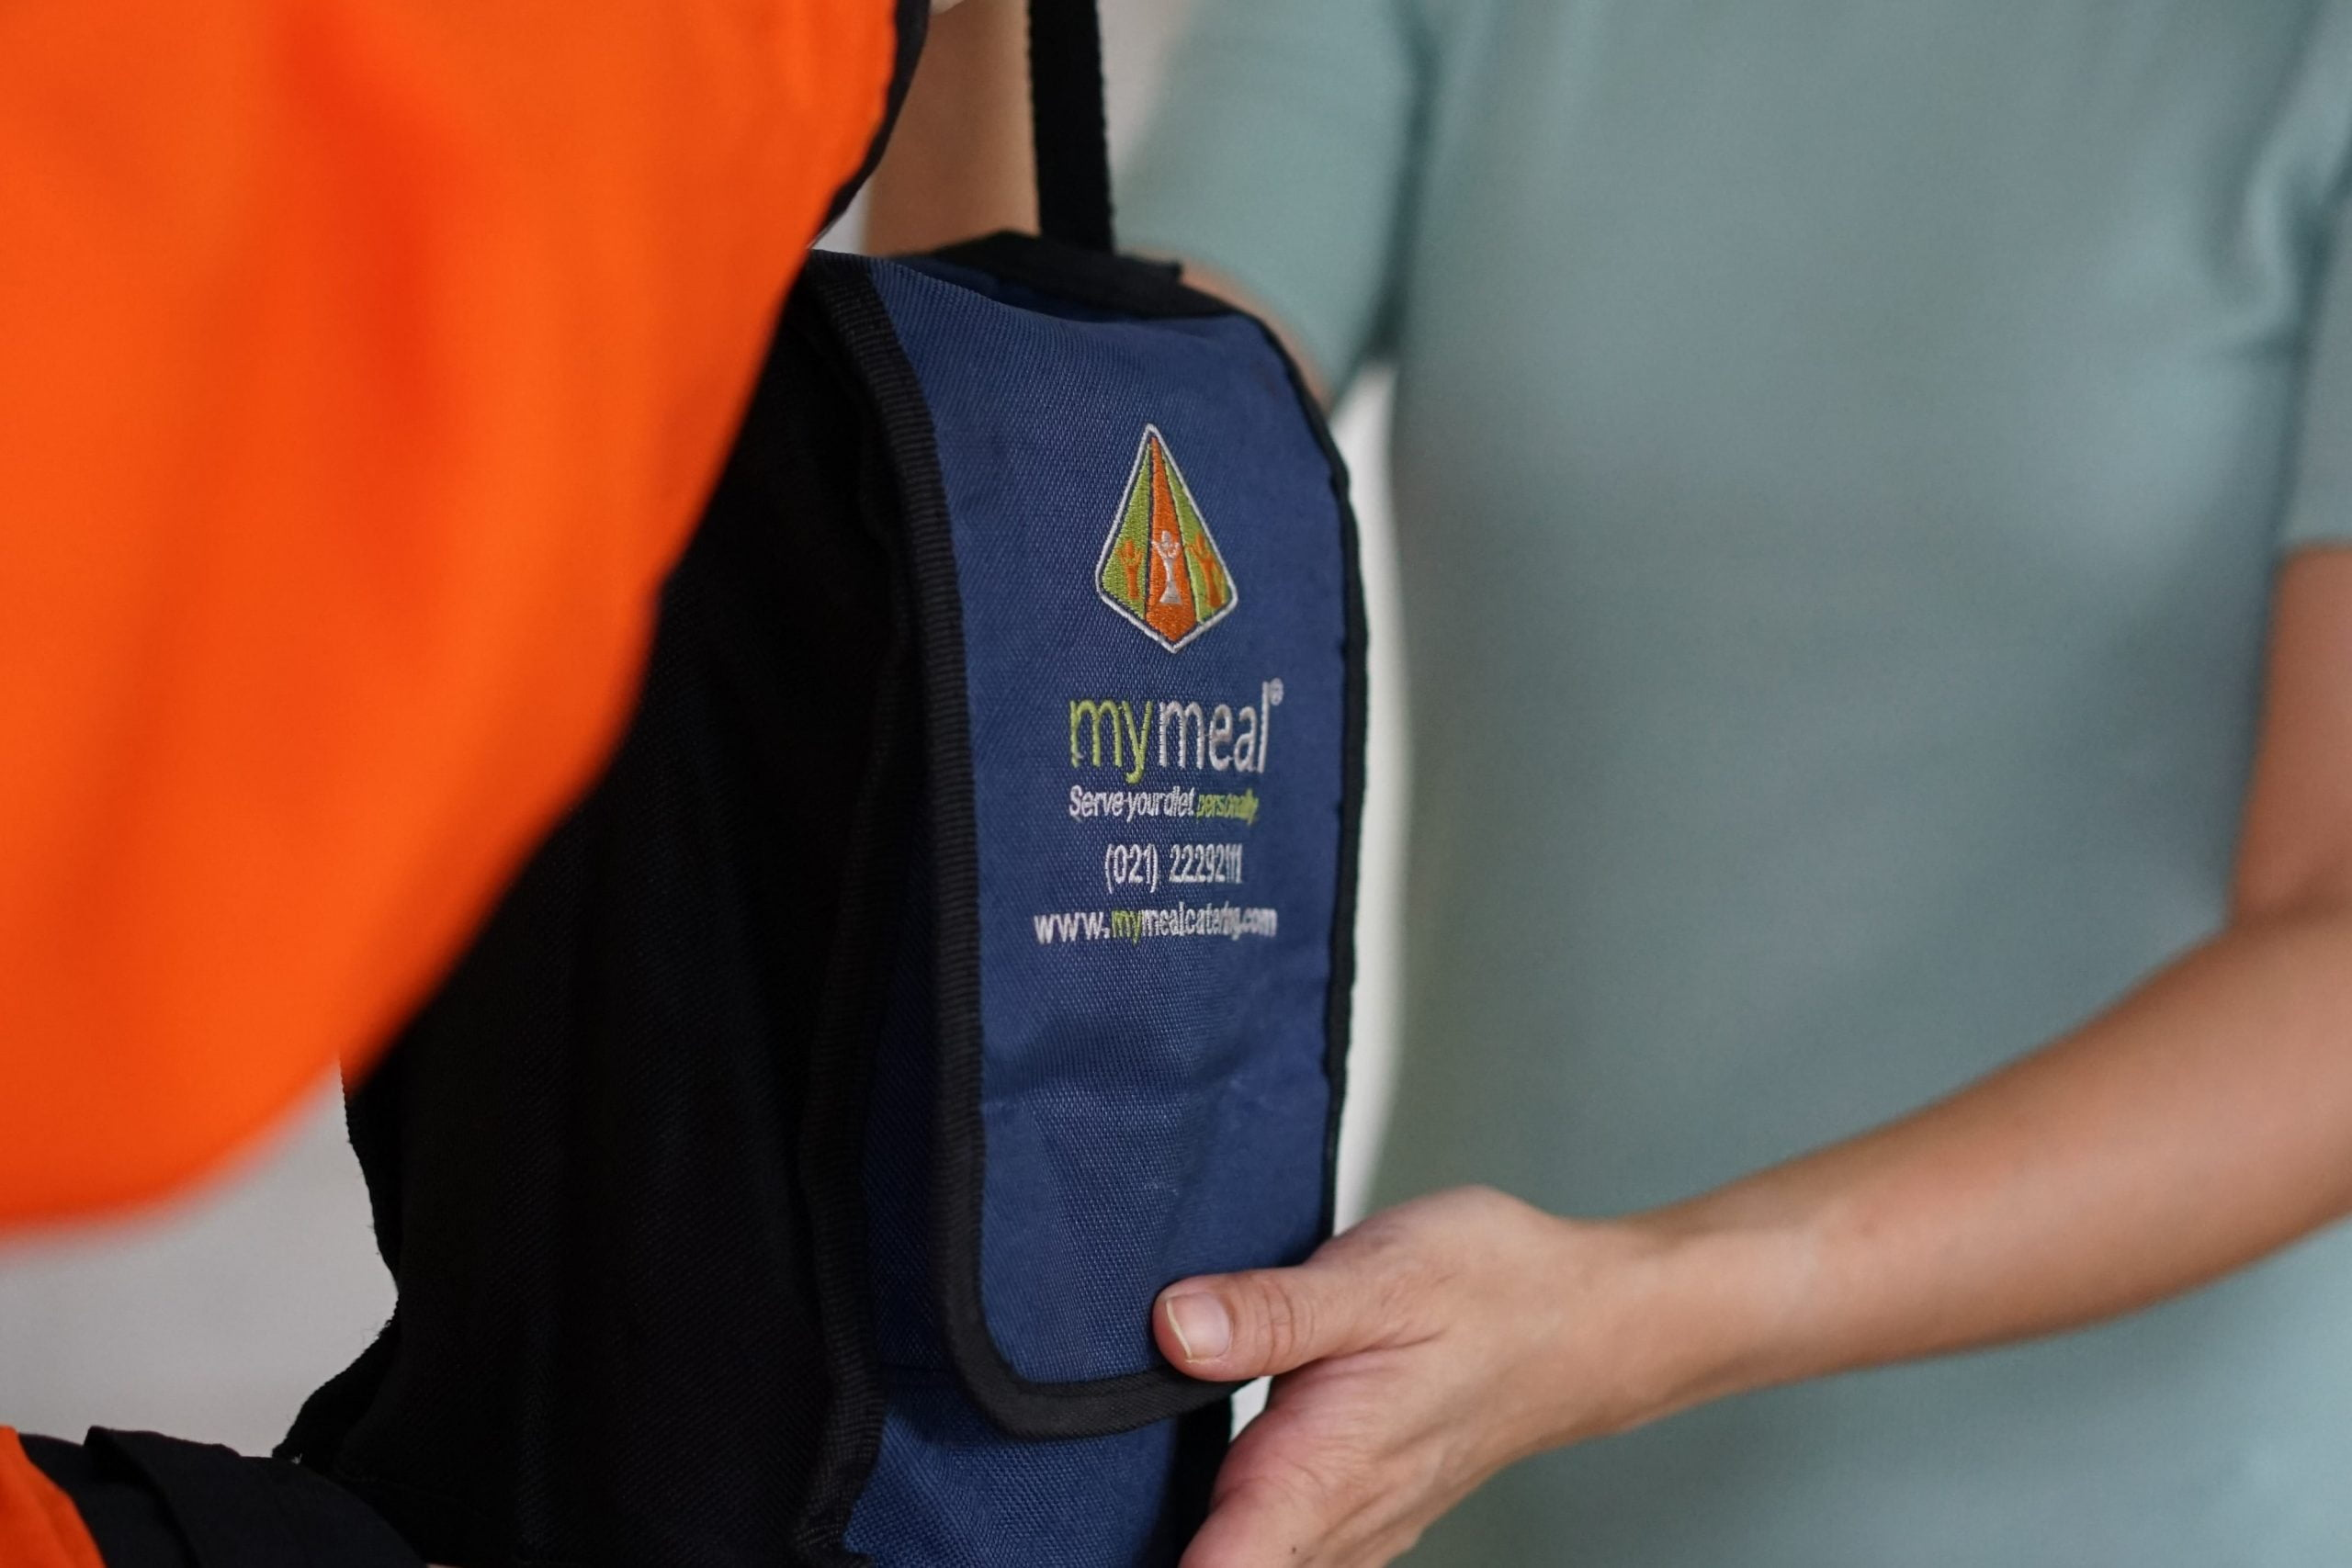 mymeal catering berkomitmen memberi kepuasan untuk customer